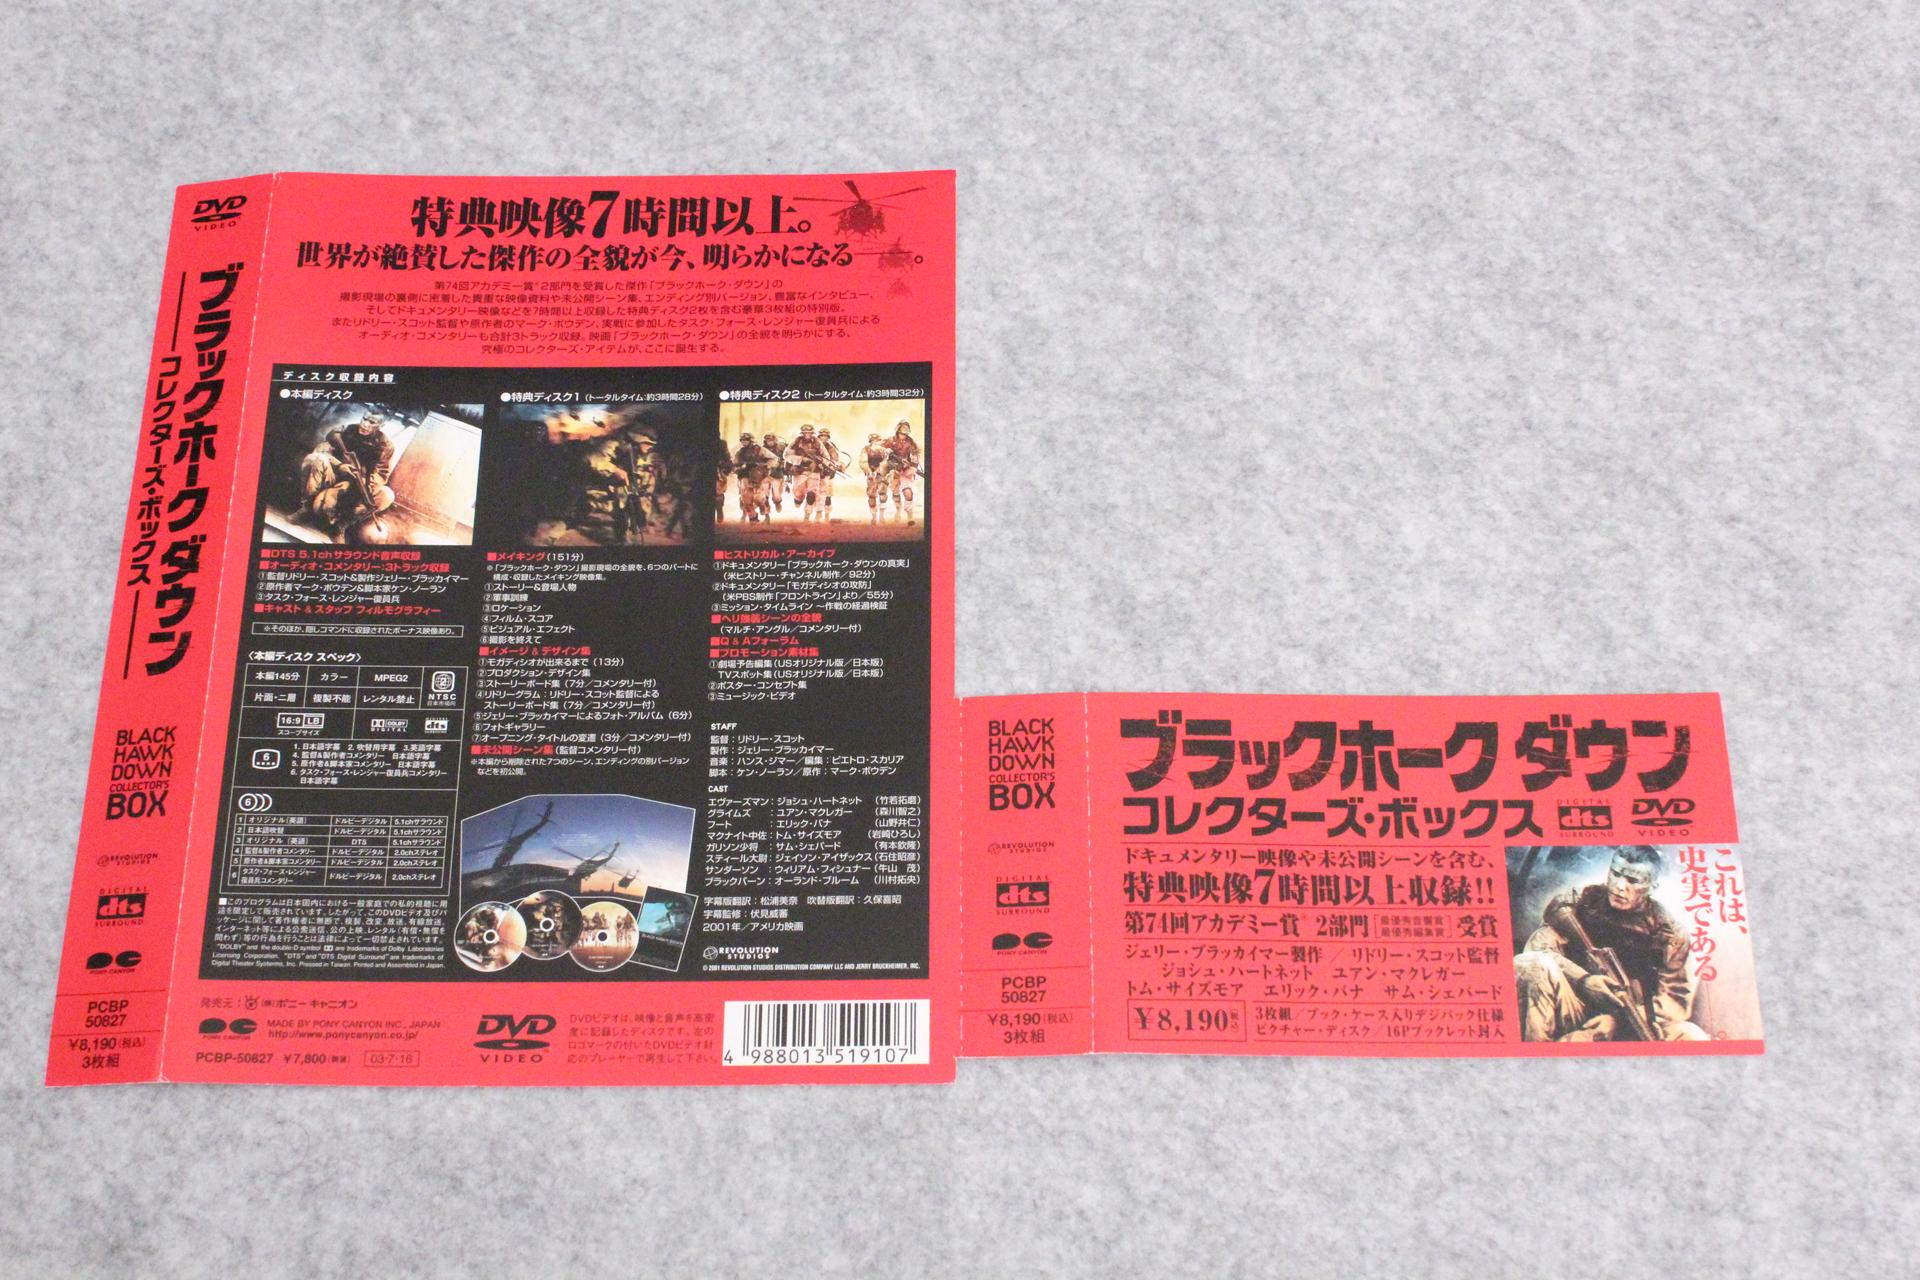 2019-12-09-BLACKHAWKDOWN-DVD_CE-04.JPG